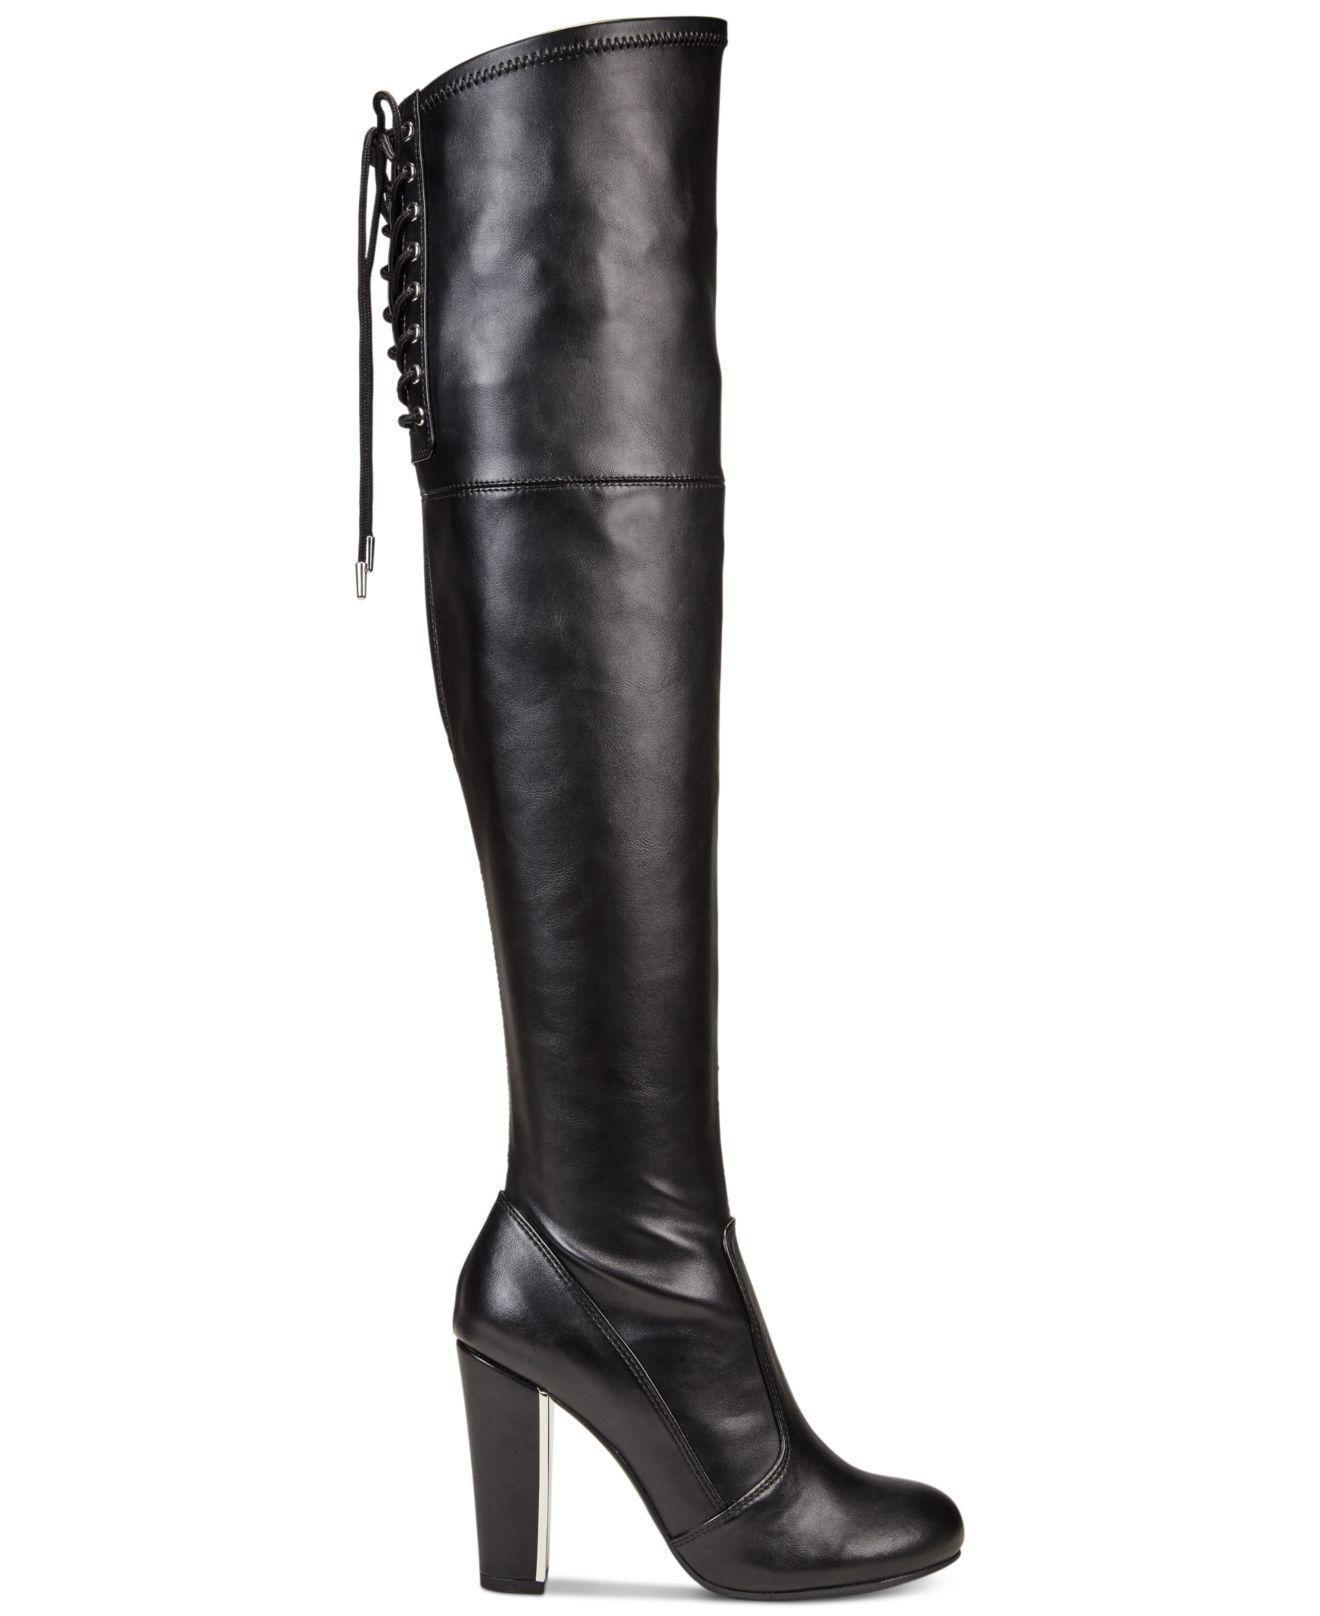 b01fef2cdd510 Lyst - Material Girl Womens Mpriyankap Closed Toe Knee High Fashion ...